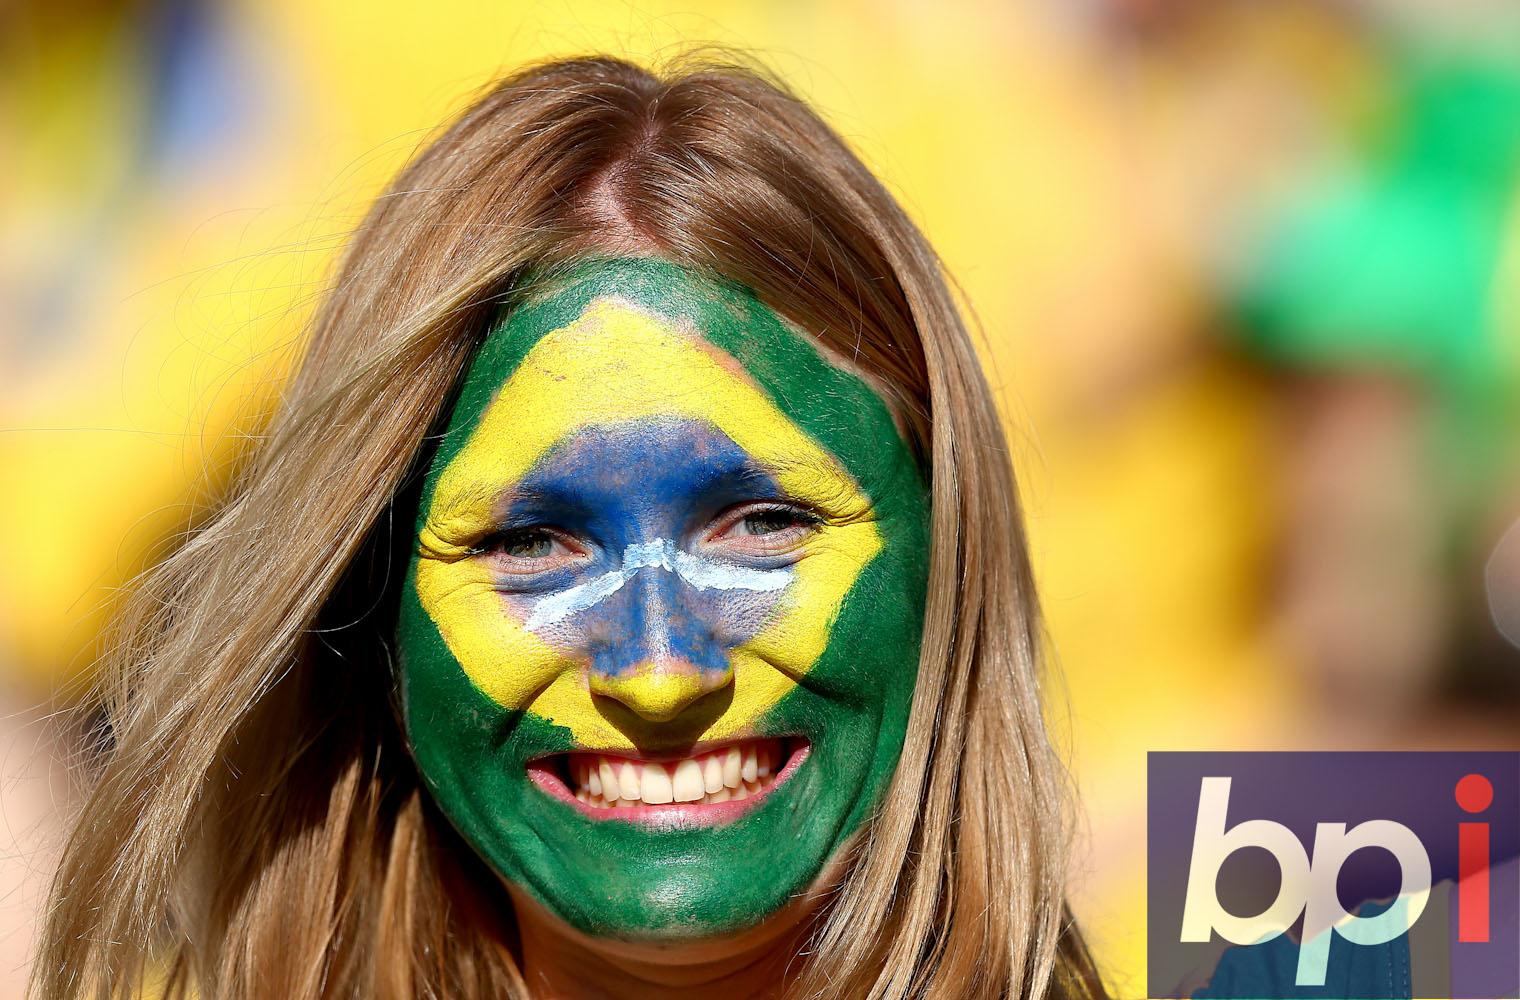 BPI_KM_BRAZIL_CROATIA_120614_019